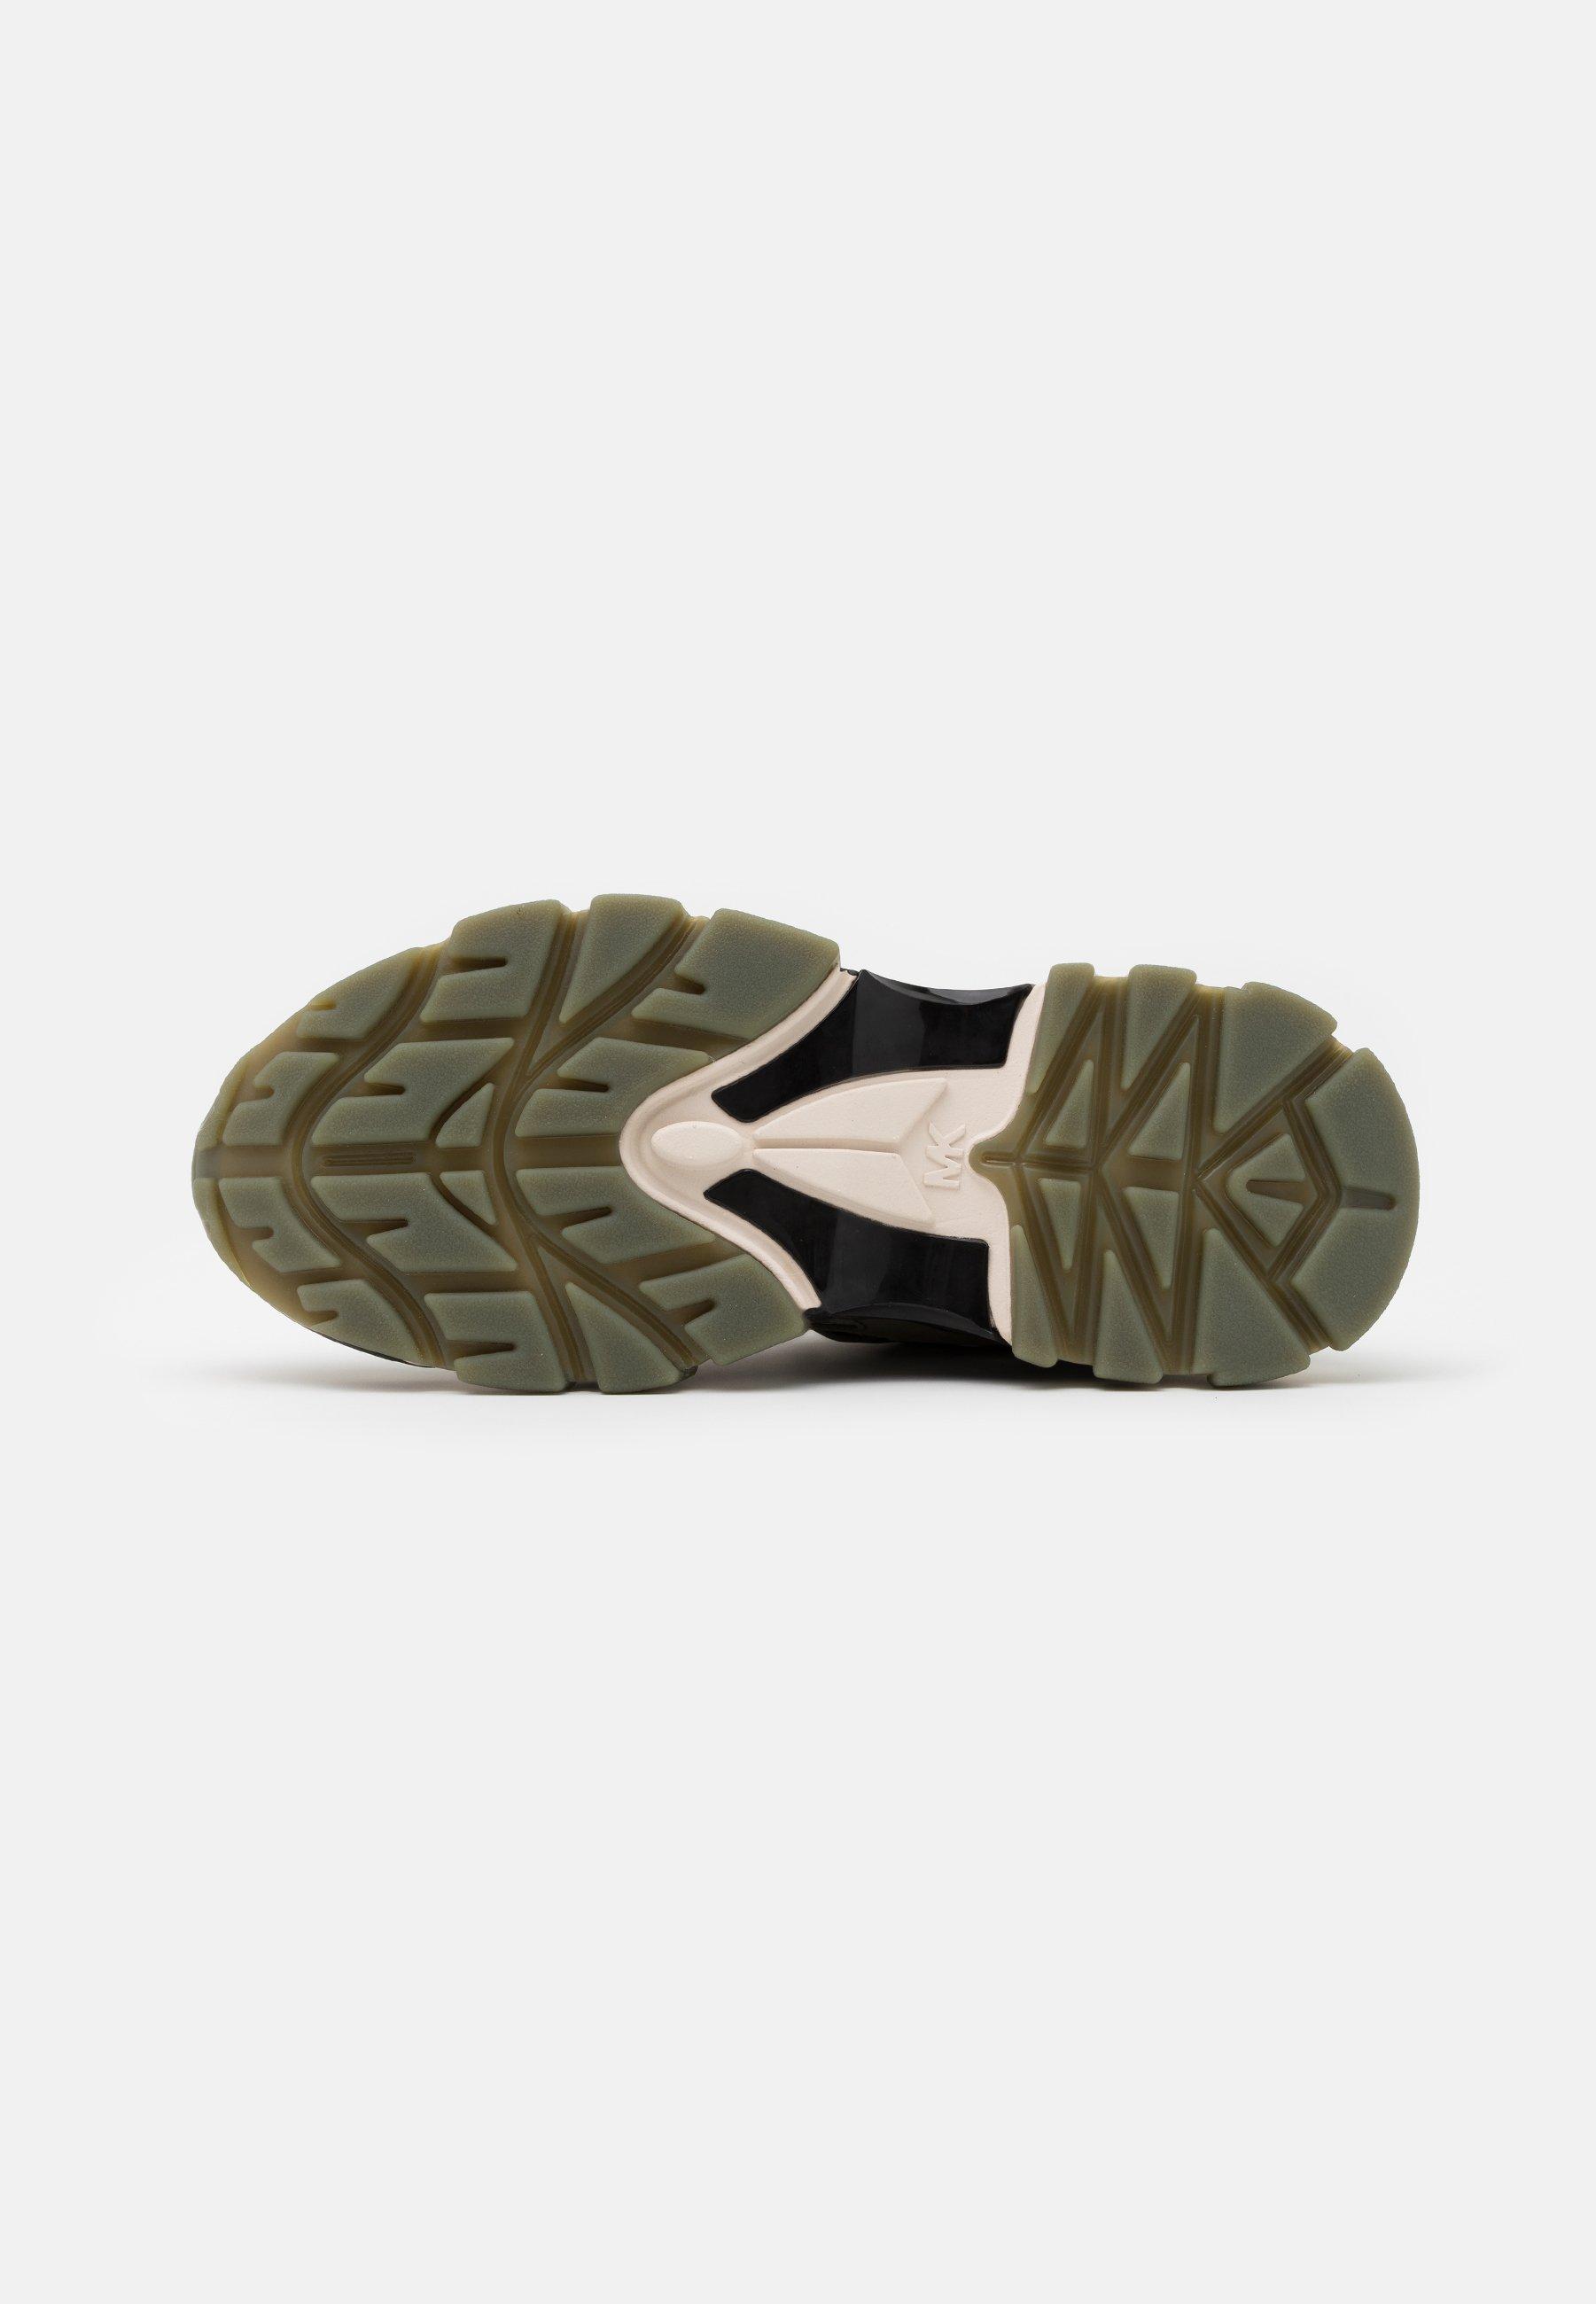 Michael Kors NICK - Sneaker low - army green/khaki - Herrenschuhe Mq3m7